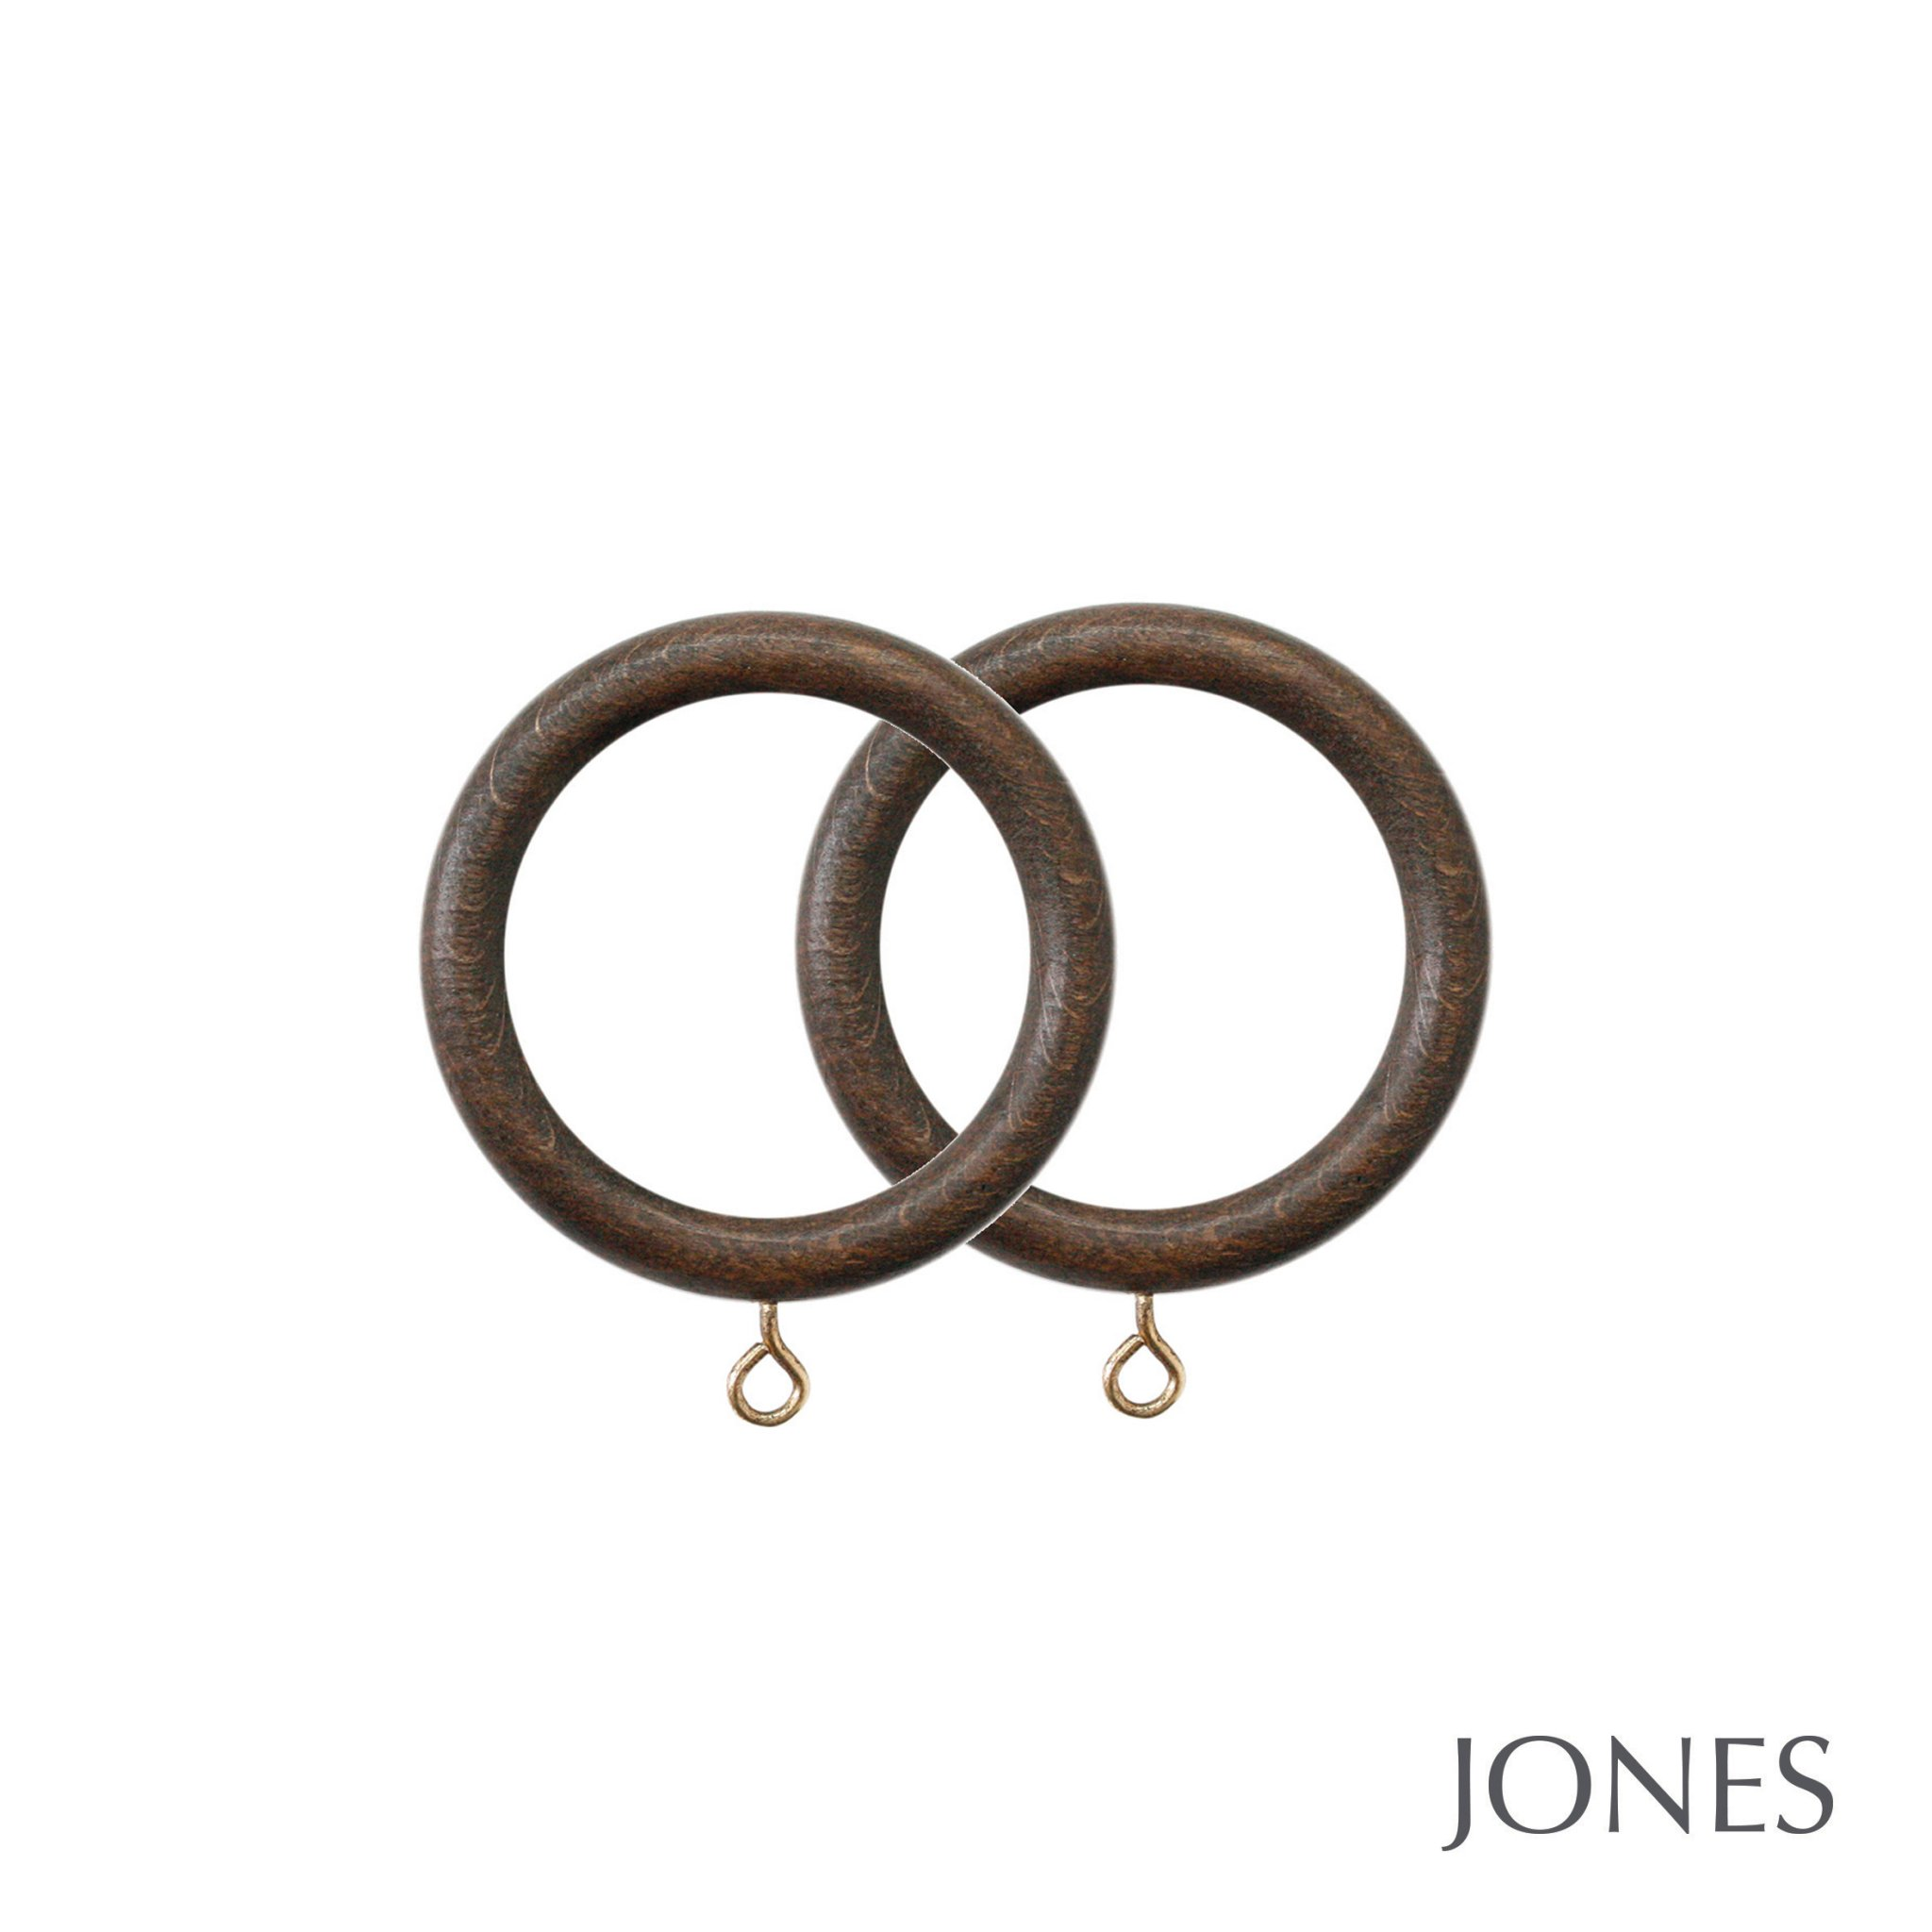 Jones Hardwick Handcrafted 40mm Curtain Rings